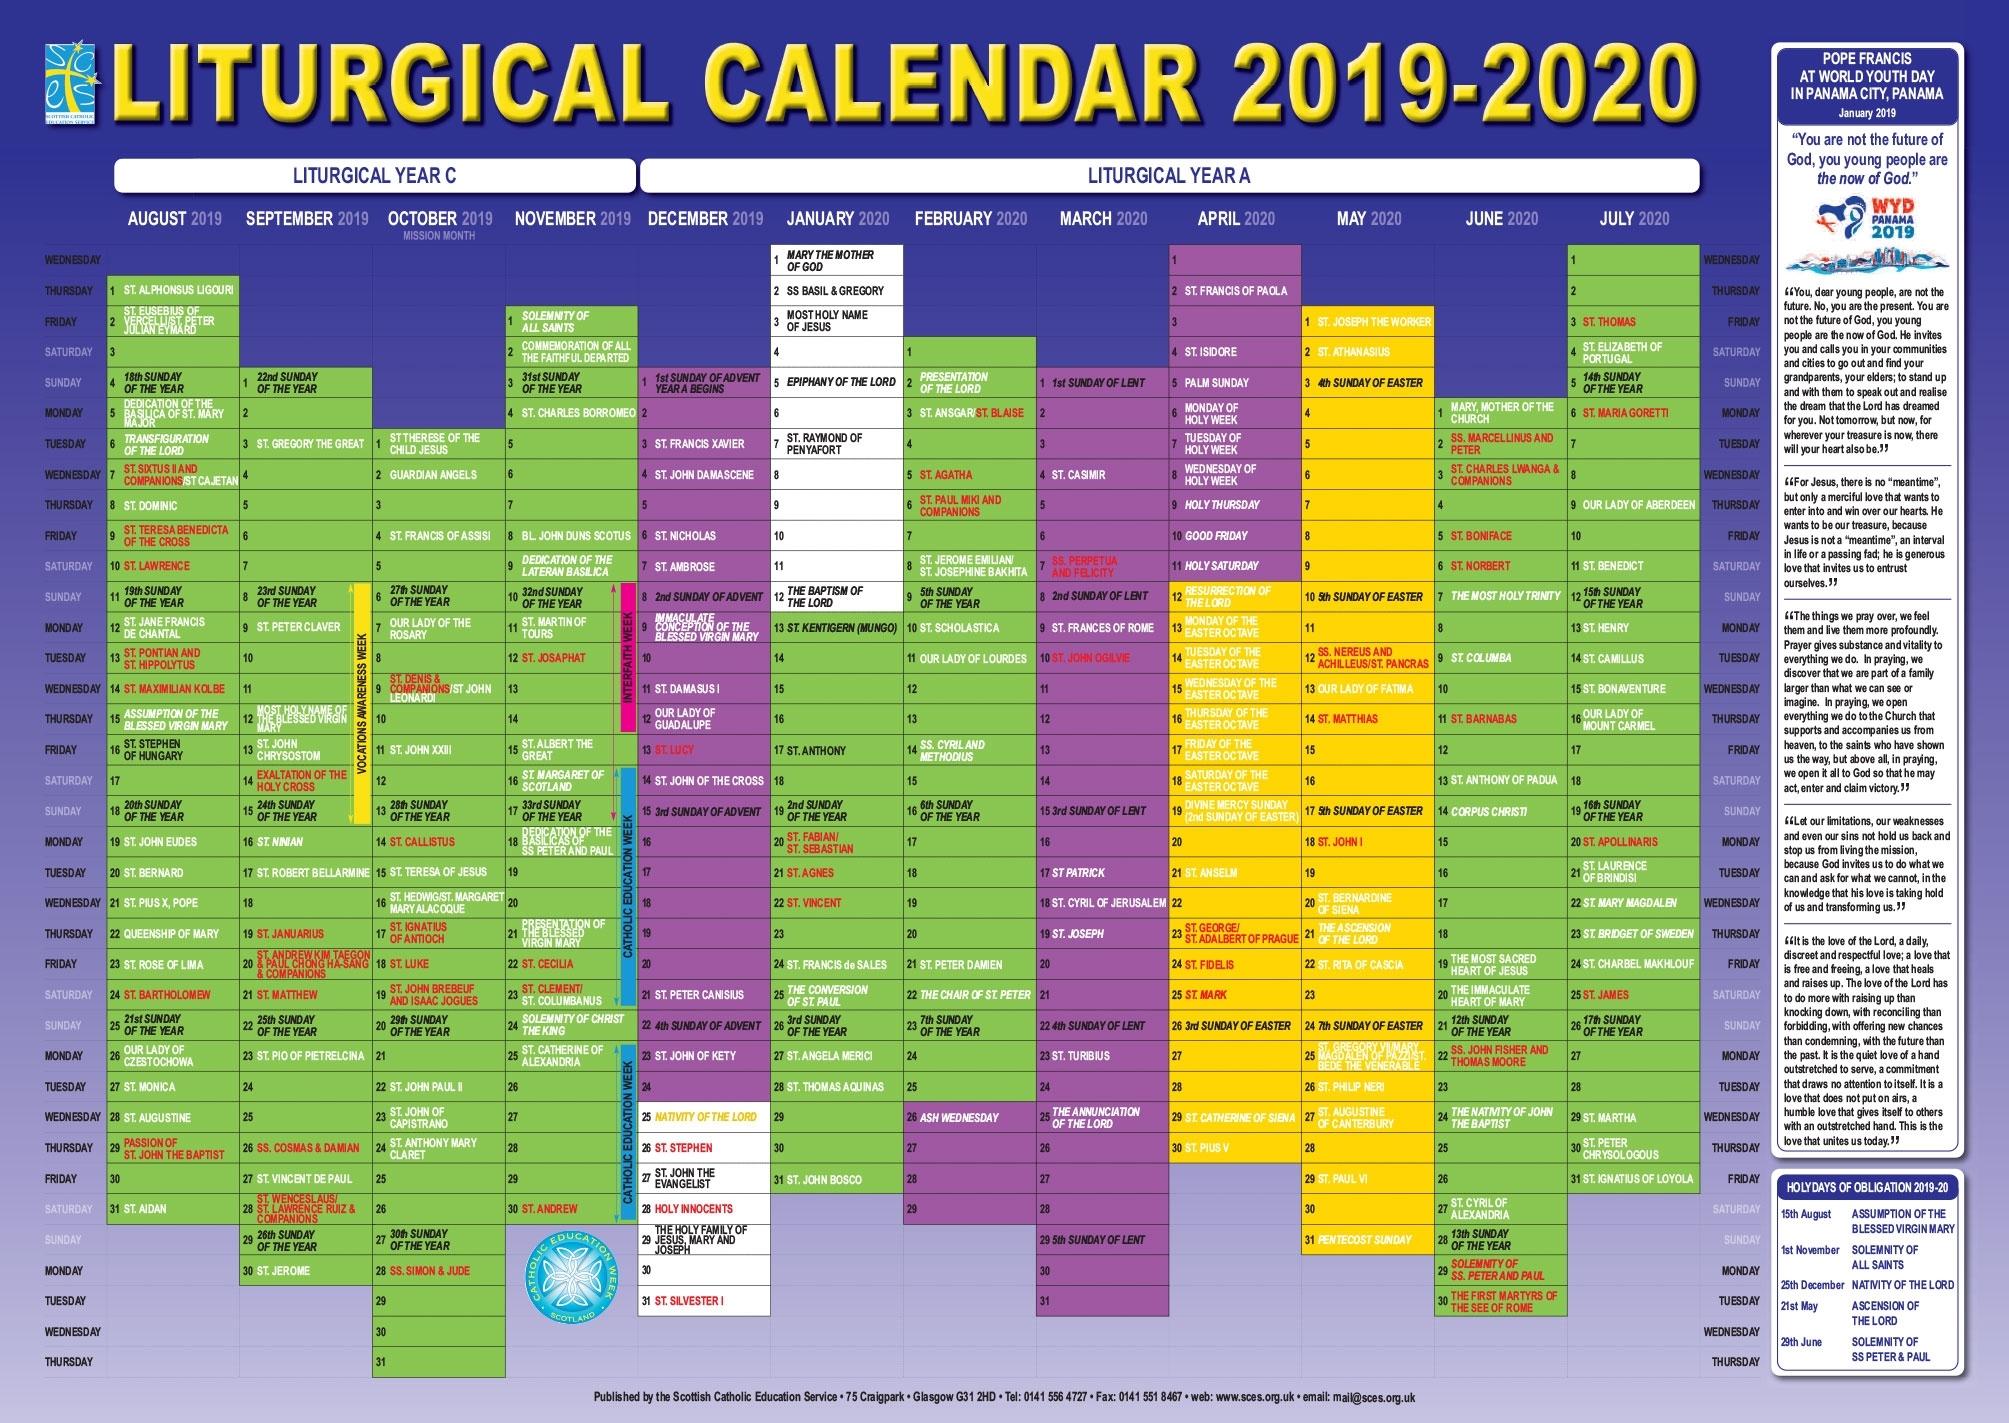 Scottish Catholic Education Service | Sces | Liturgical with regard to Catholic Liturgical Calendar 2019 2020